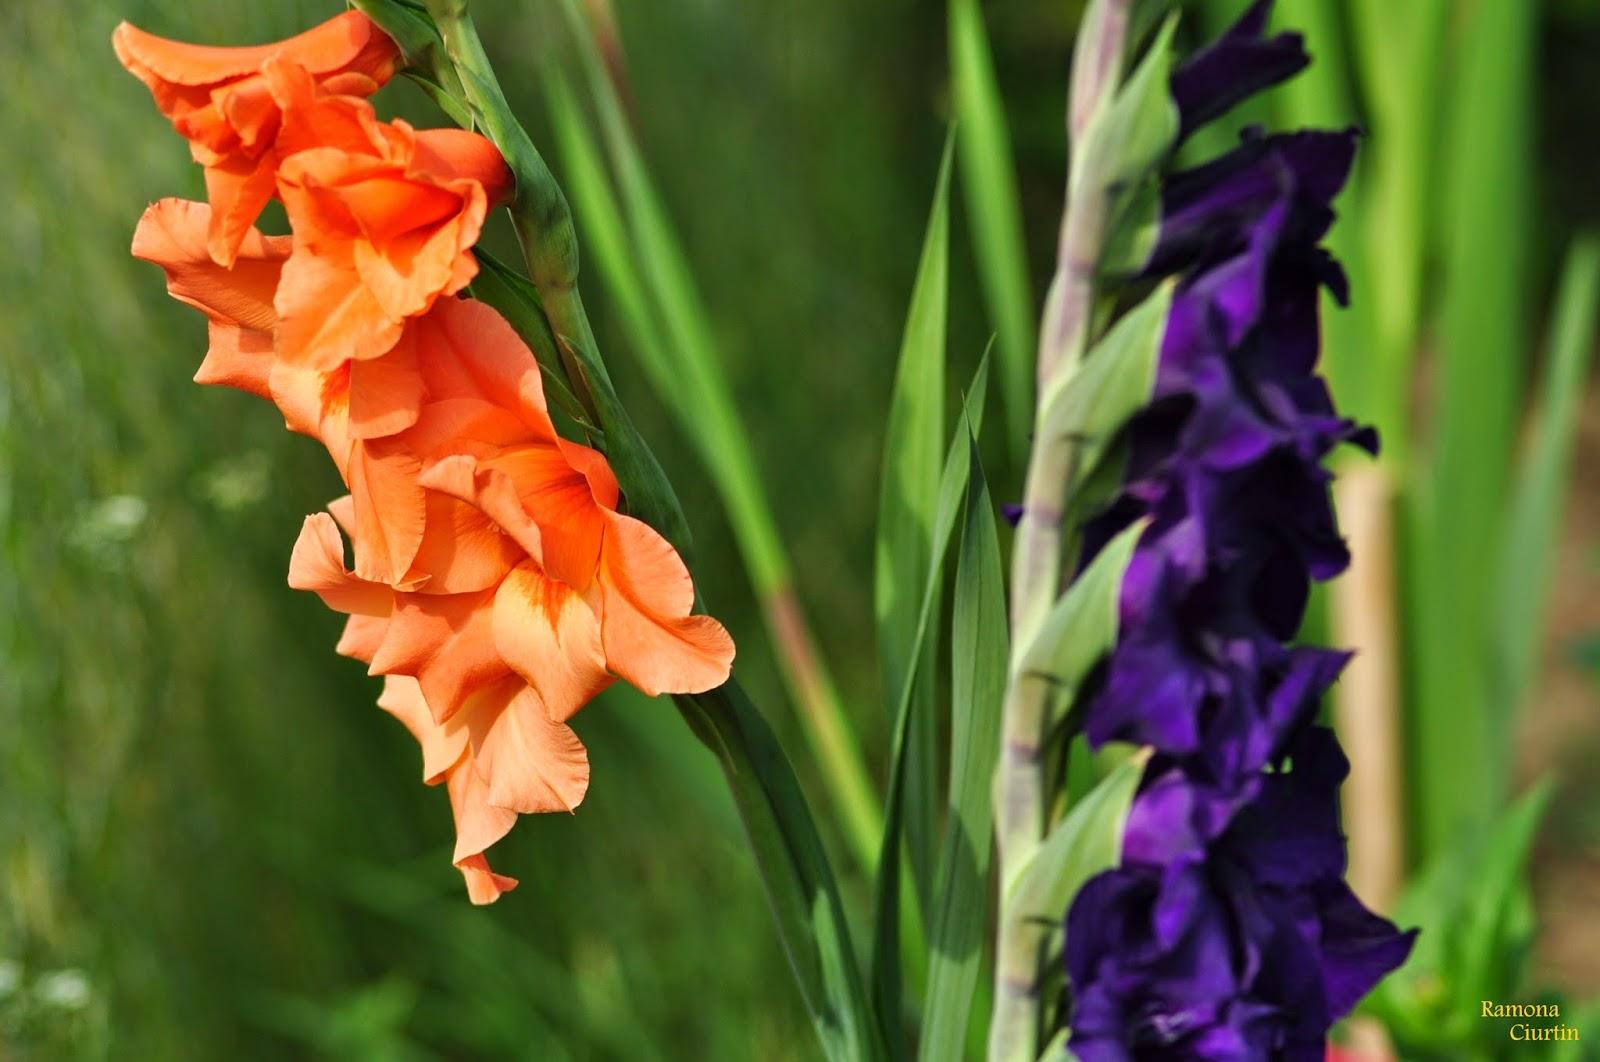 Beautiful Gladiolus Iridaceae flower